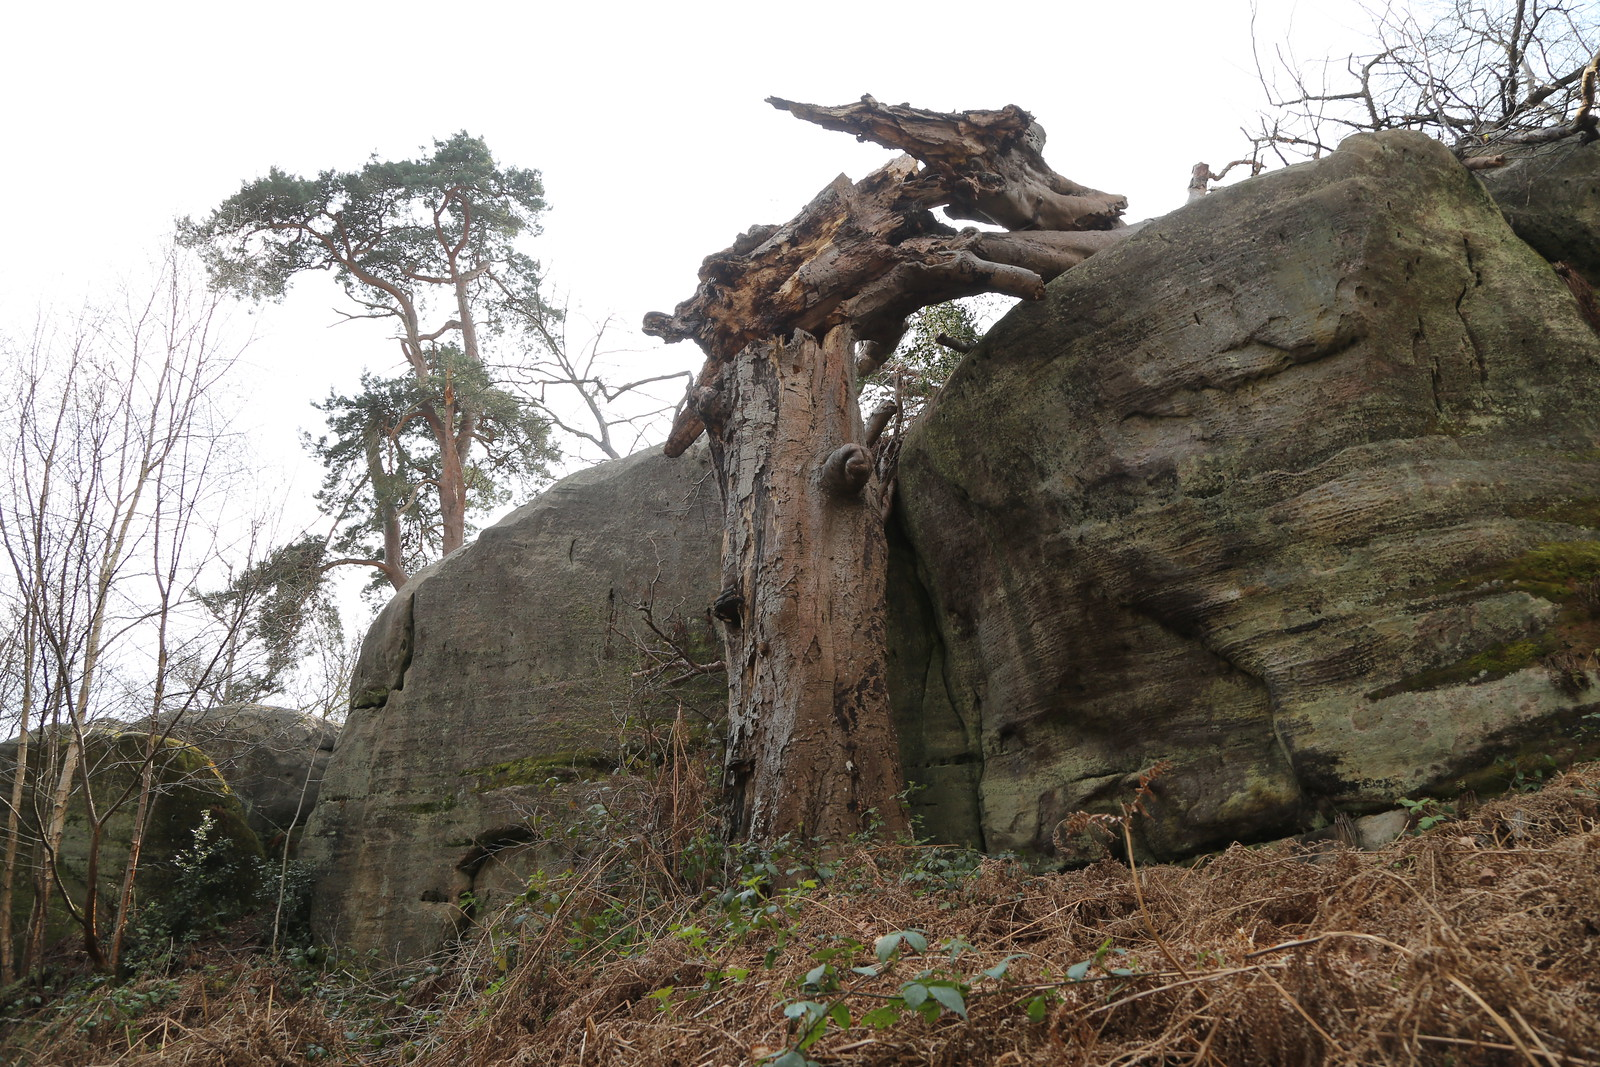 Trees and Eridge Rocks